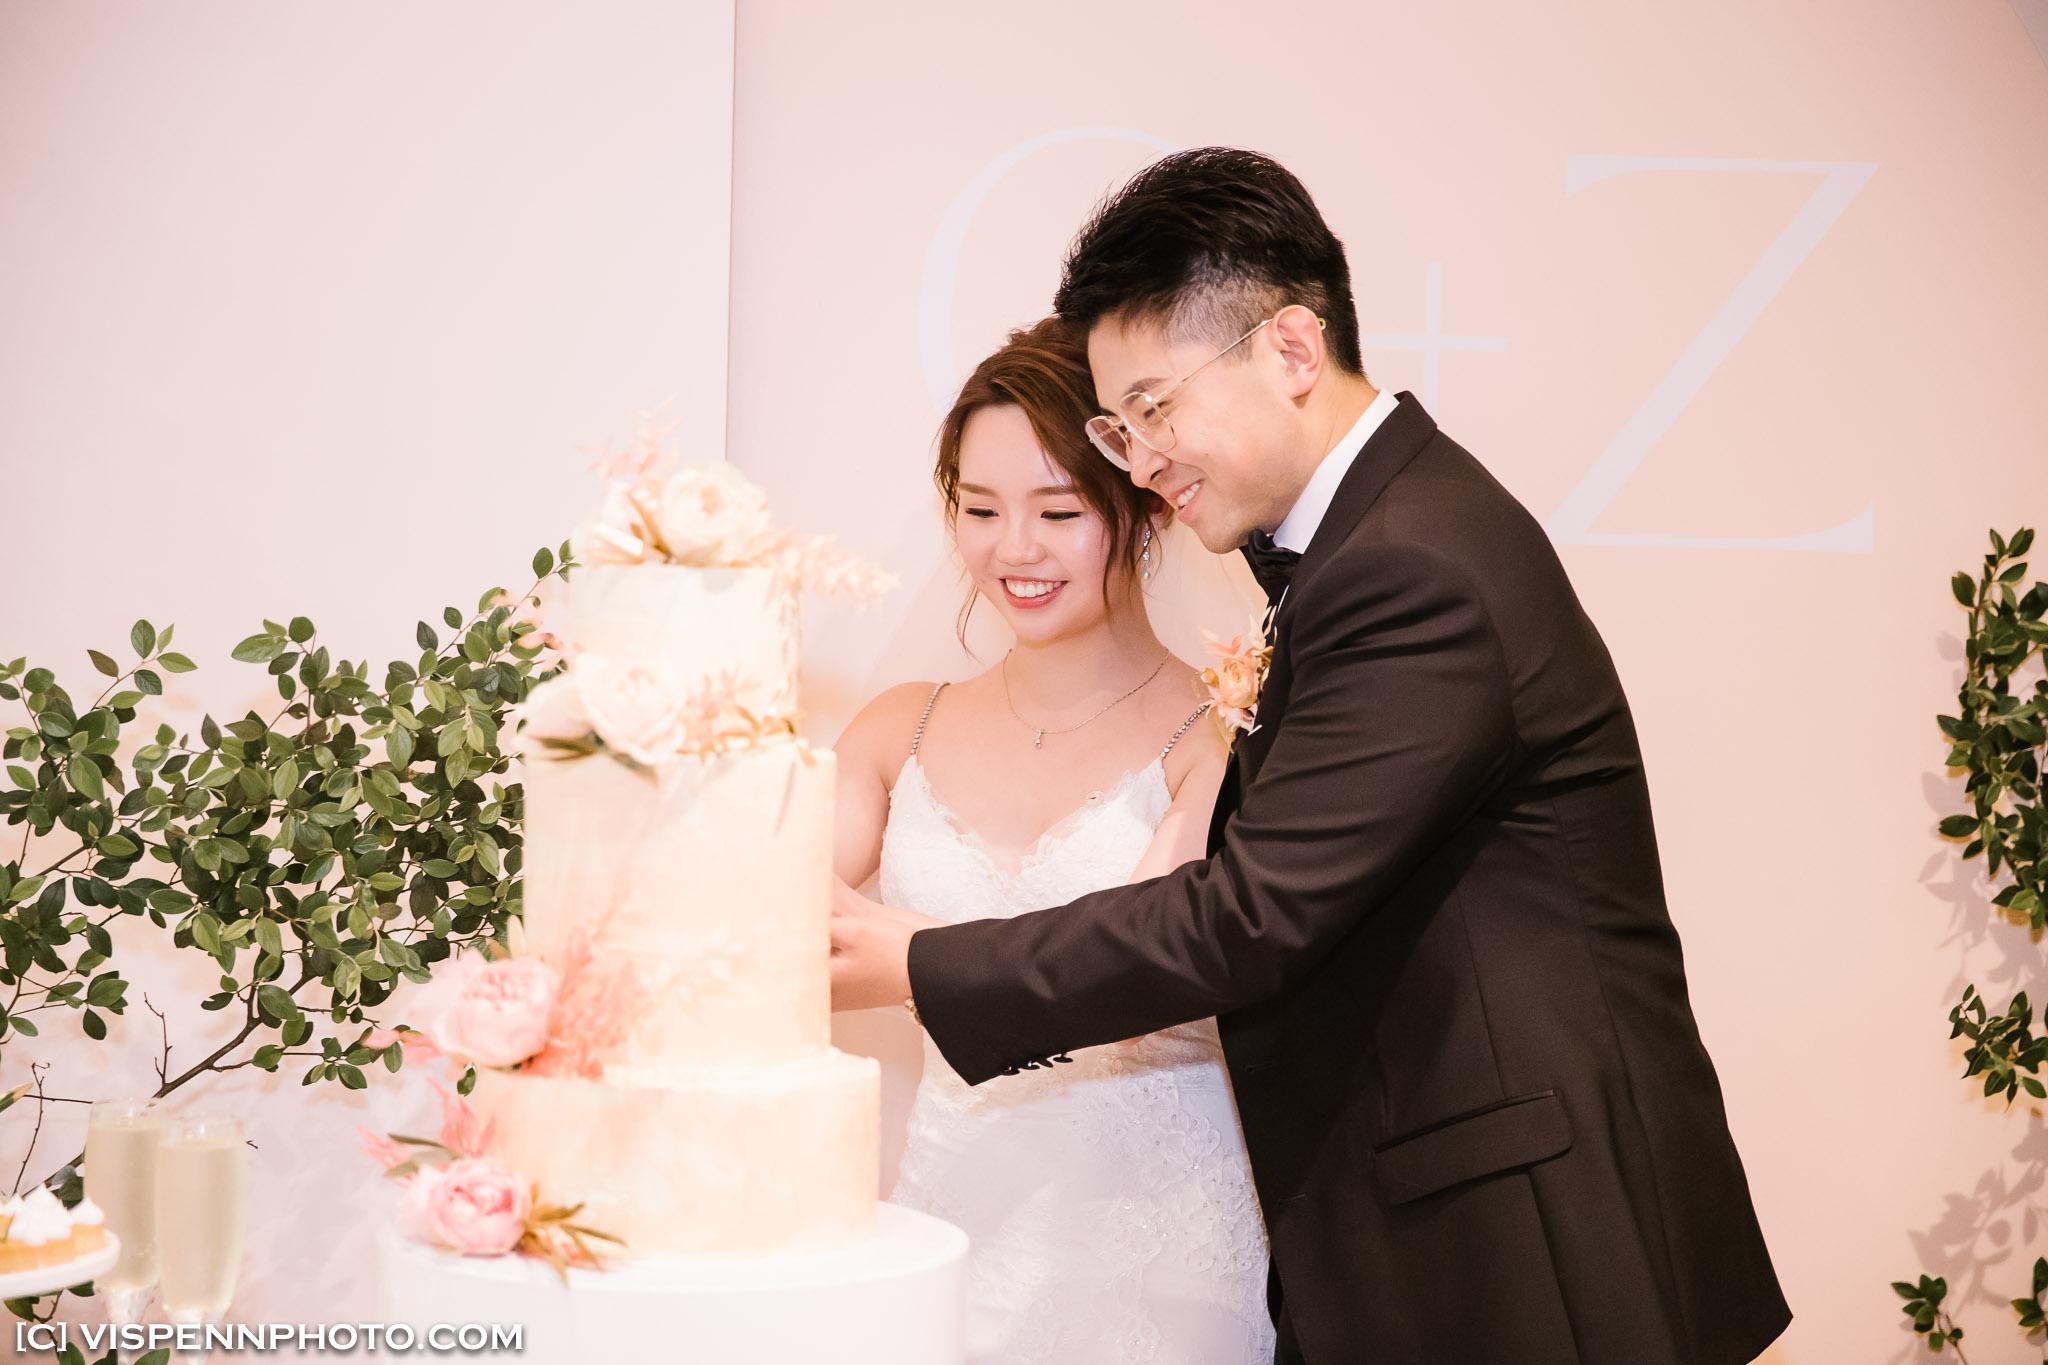 WEDDING DAY Photography Melbourne ElitaPB 10057 2P 1DX2 ZHPENN